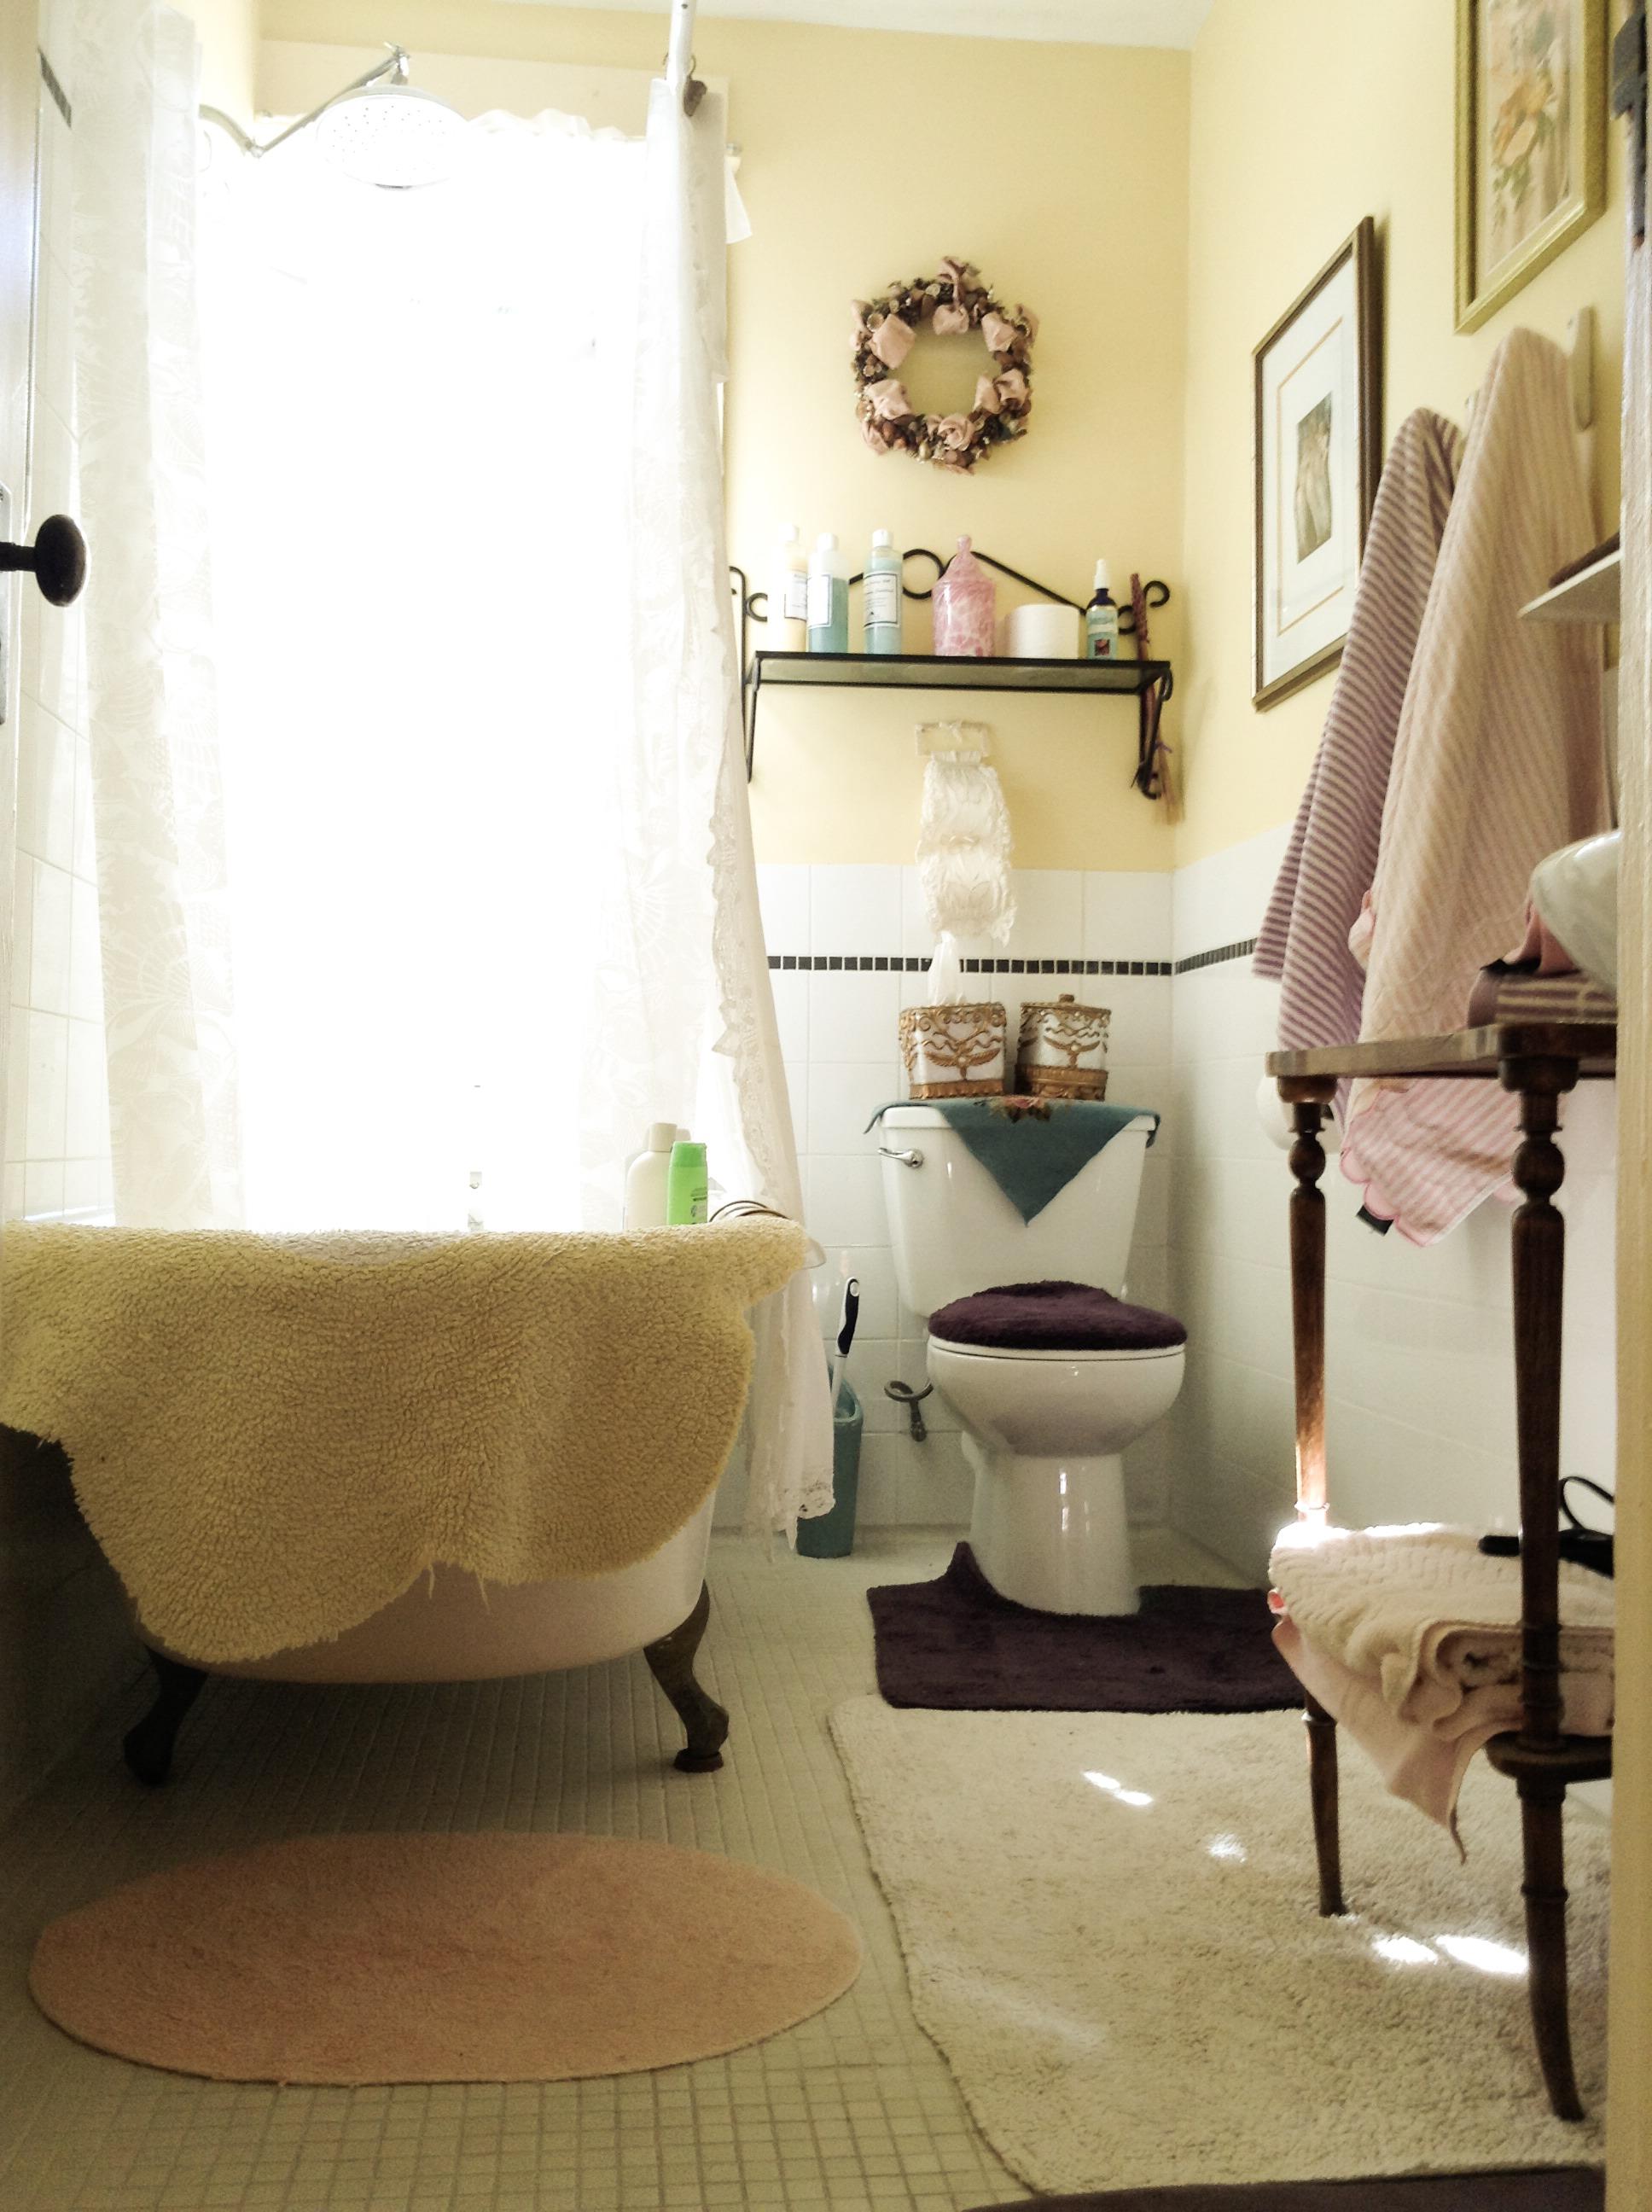 Private Lavender Bathroom Victorian Clawfoot Tub